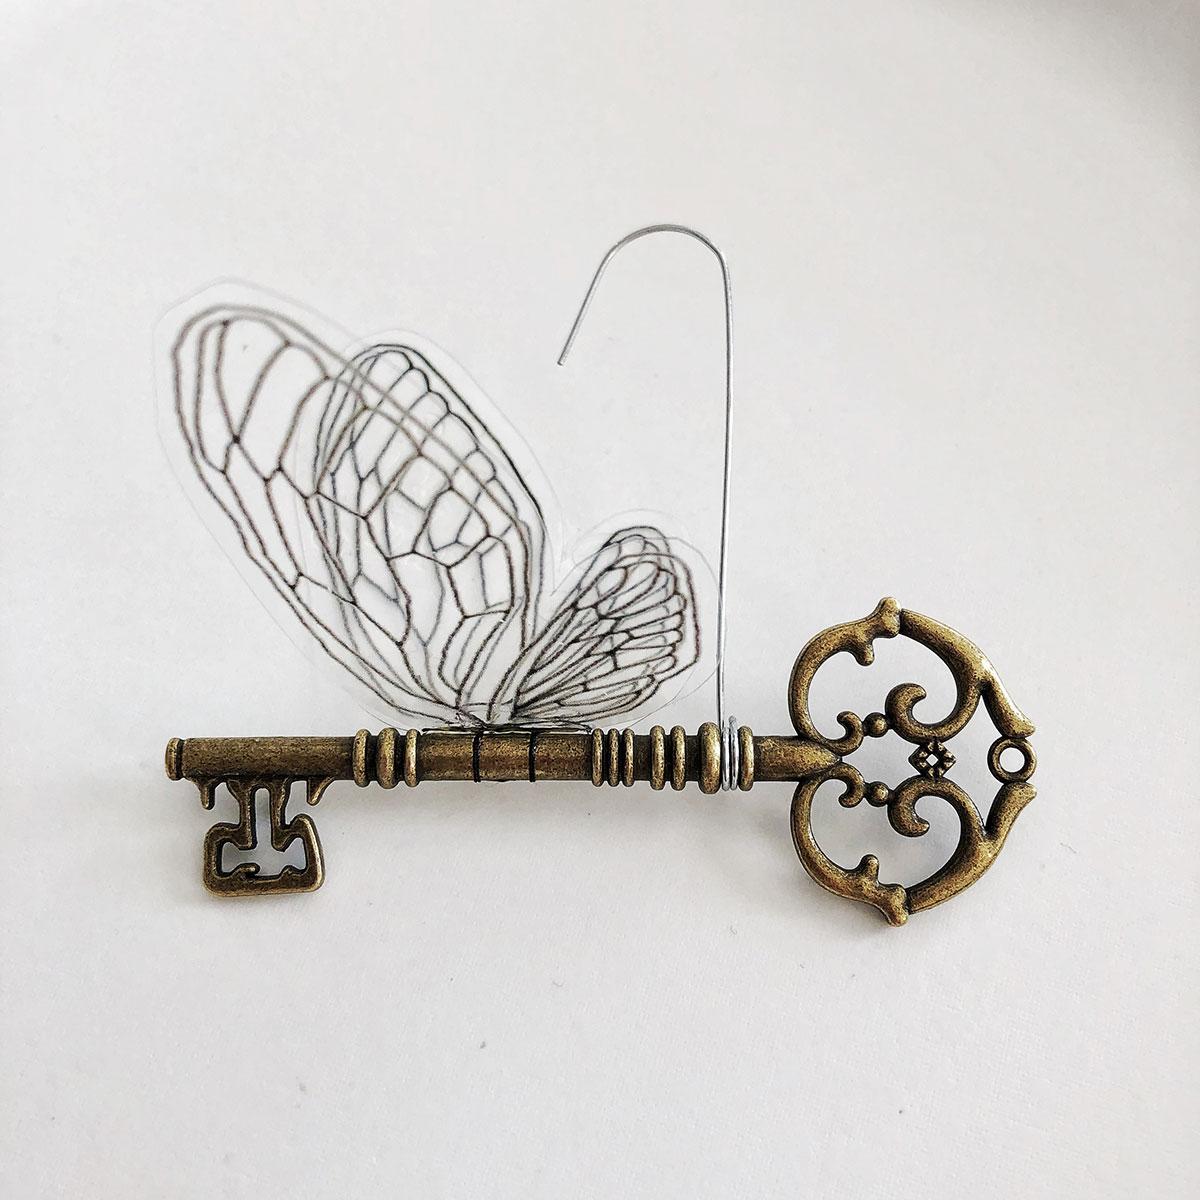 jenn-garman-artist-ornament-flying-key